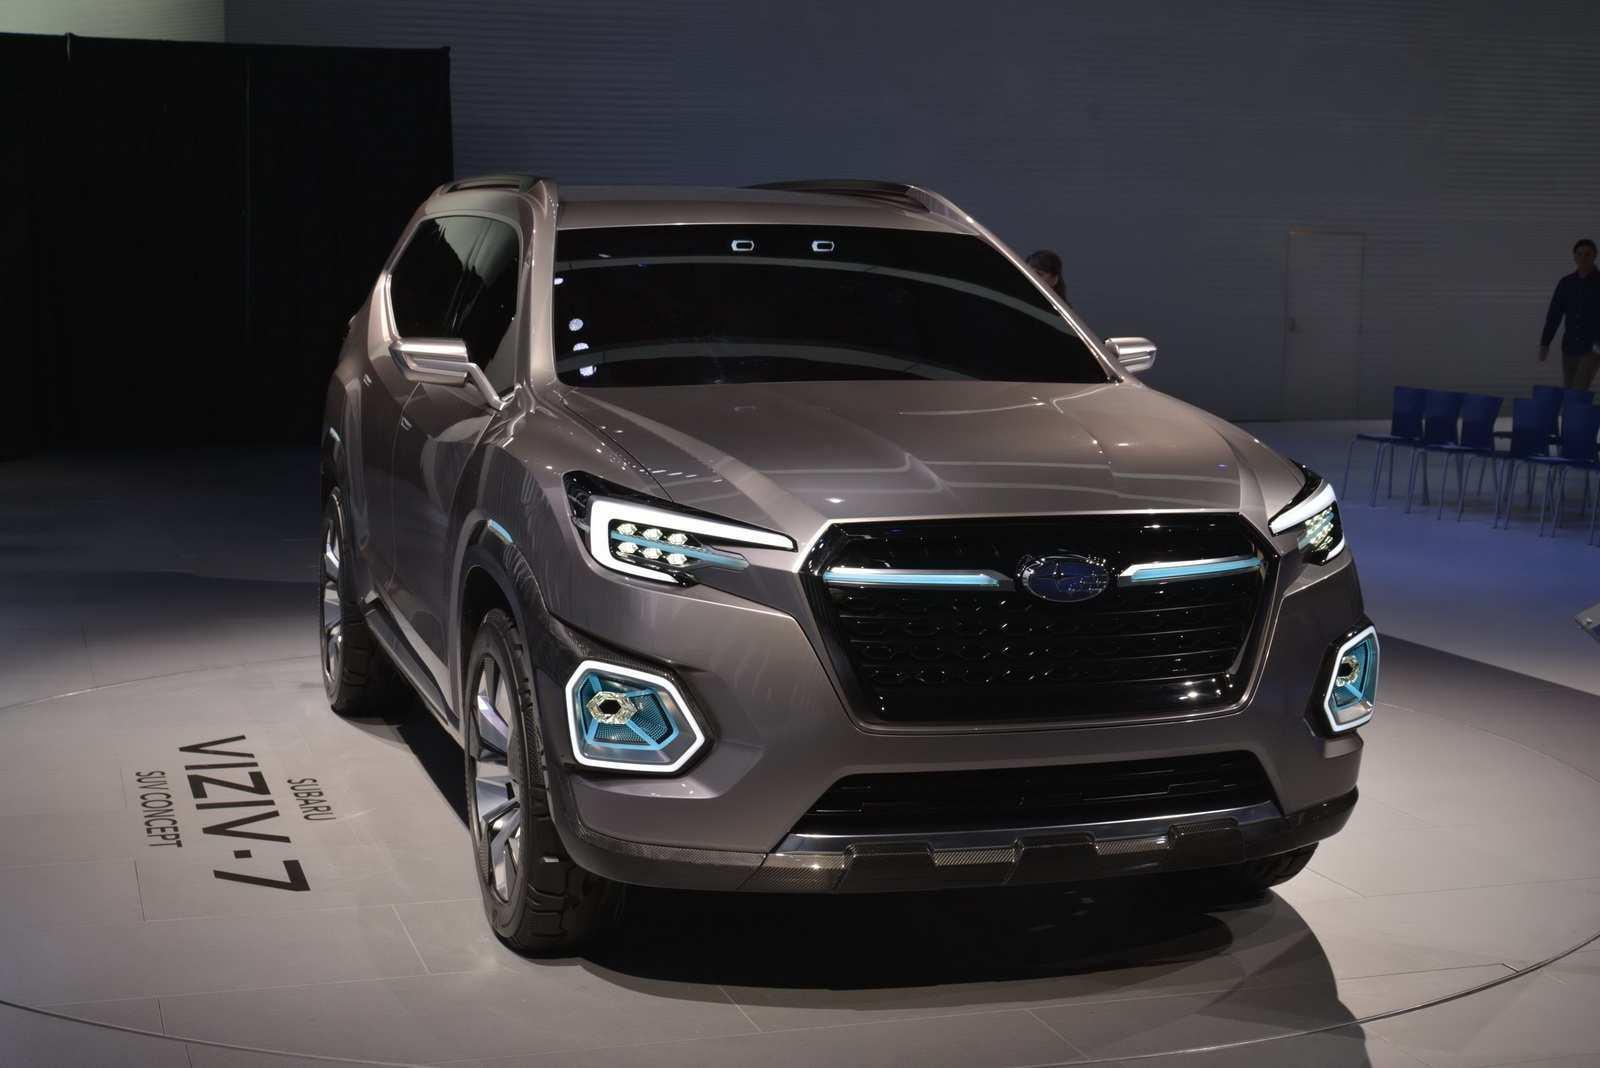 39 New 2020 Subaru Viziv Pickup Picture for 2020 Subaru Viziv Pickup